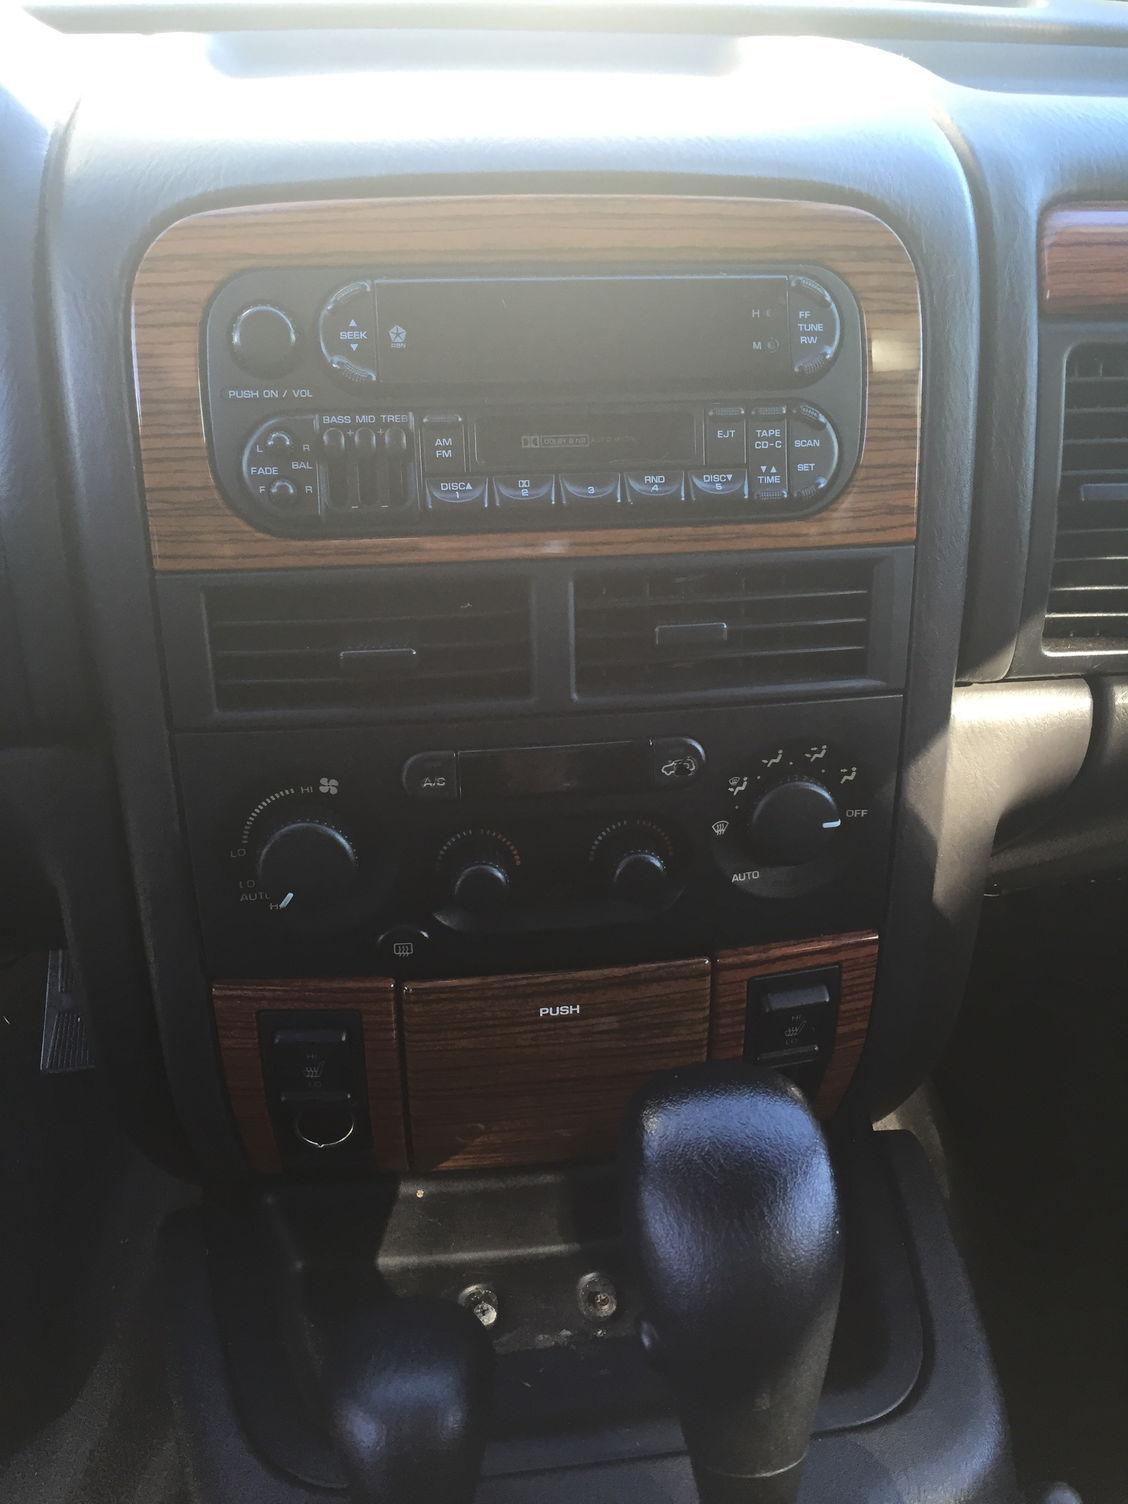 Early 2000s Gc Reliable Jeep Cherokee Forum 1999 Grand Door Driver Panel